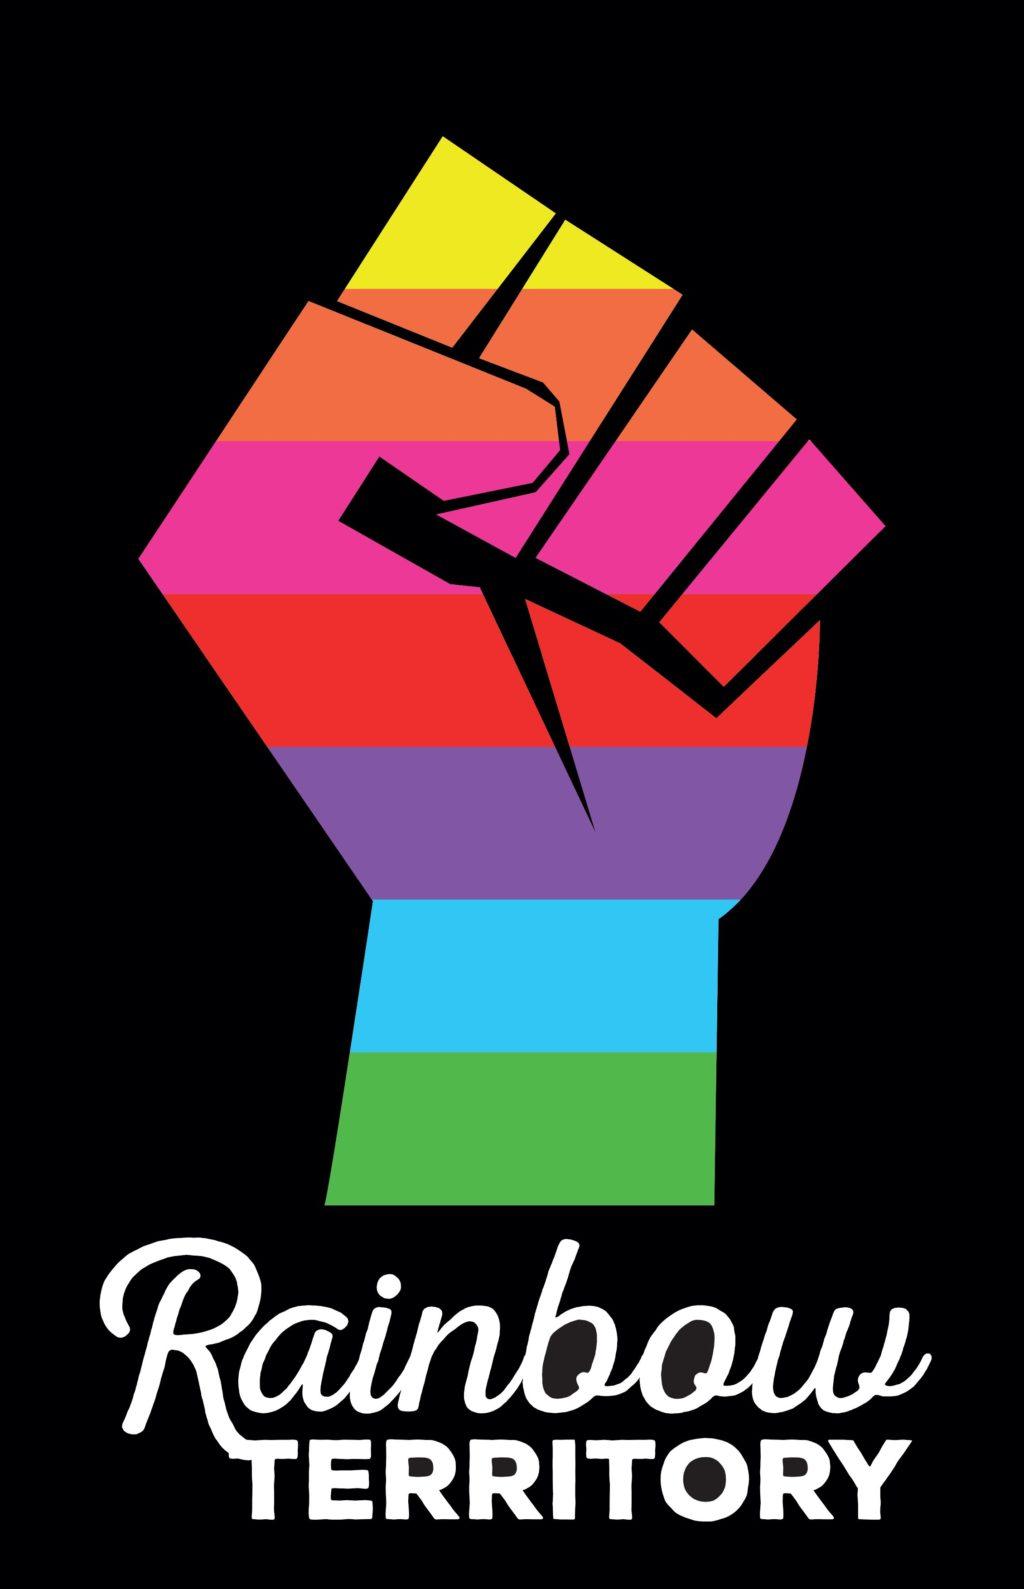 Rainbow Territory jpeg logo.jpg